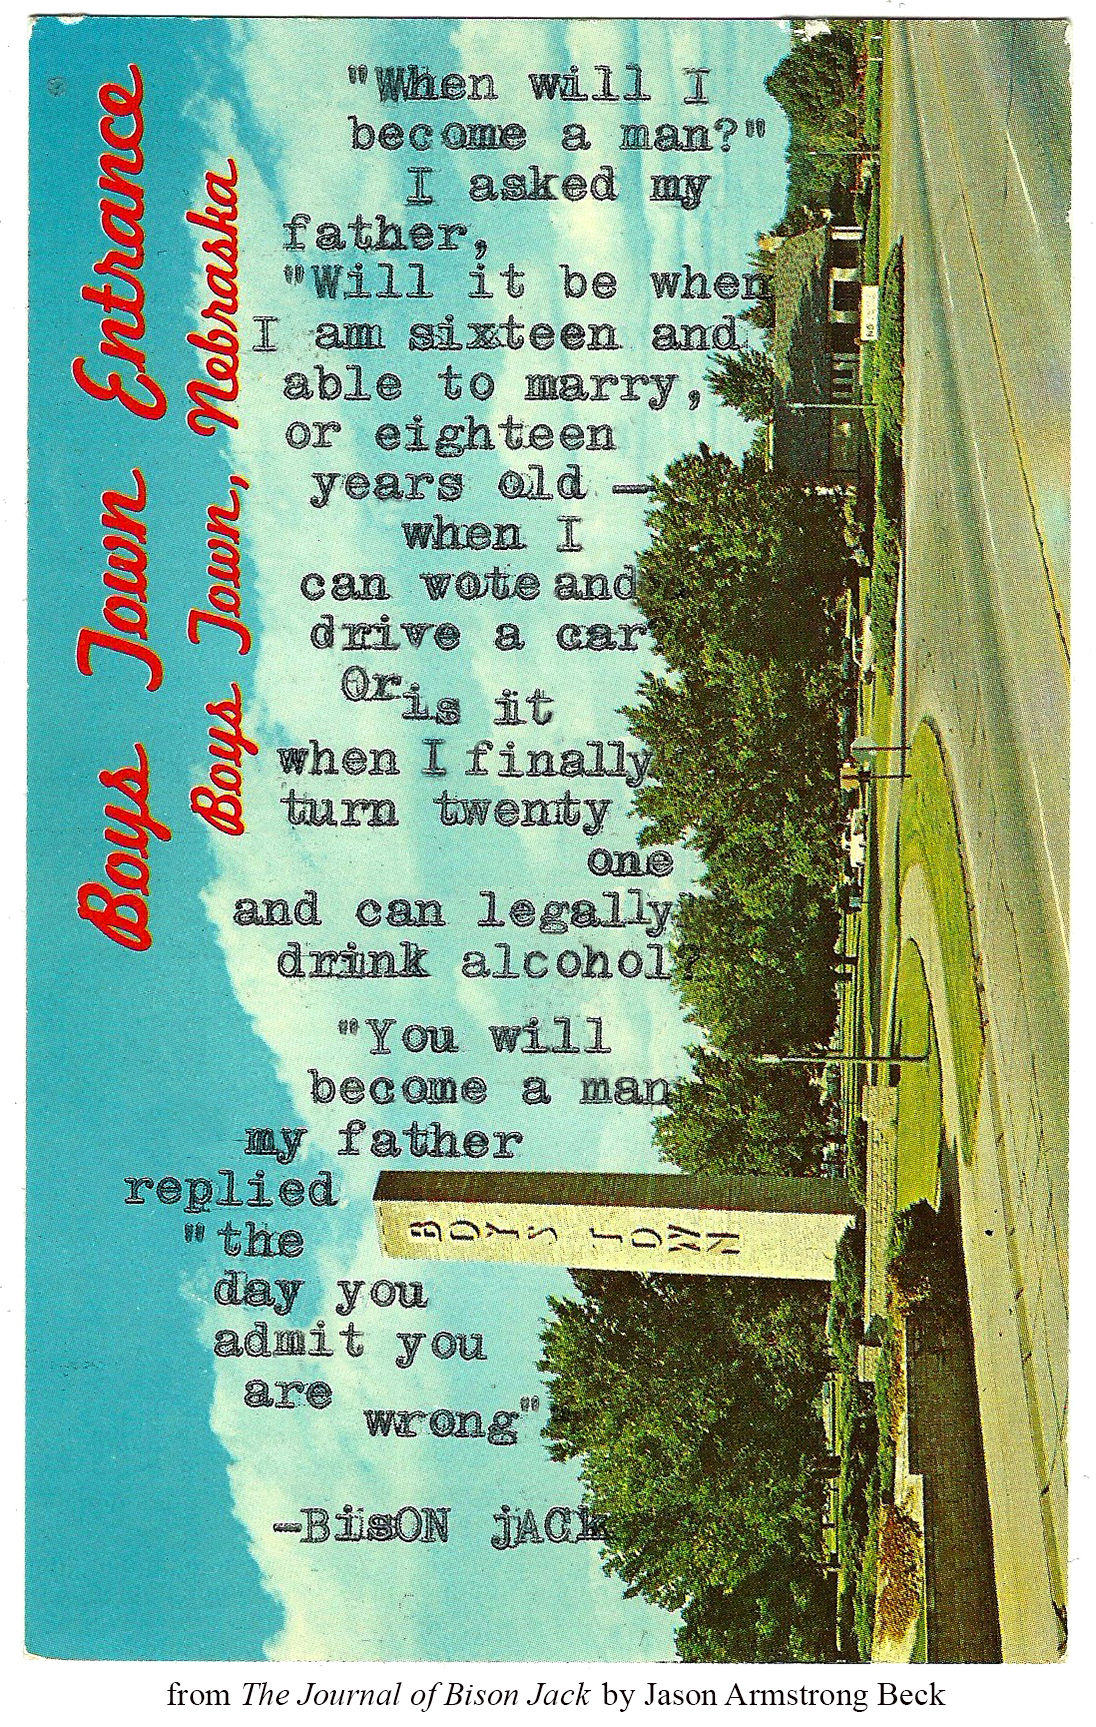 thejournalofbisonjack: BOYS TOWN, NEBRASKA / a fall bloom